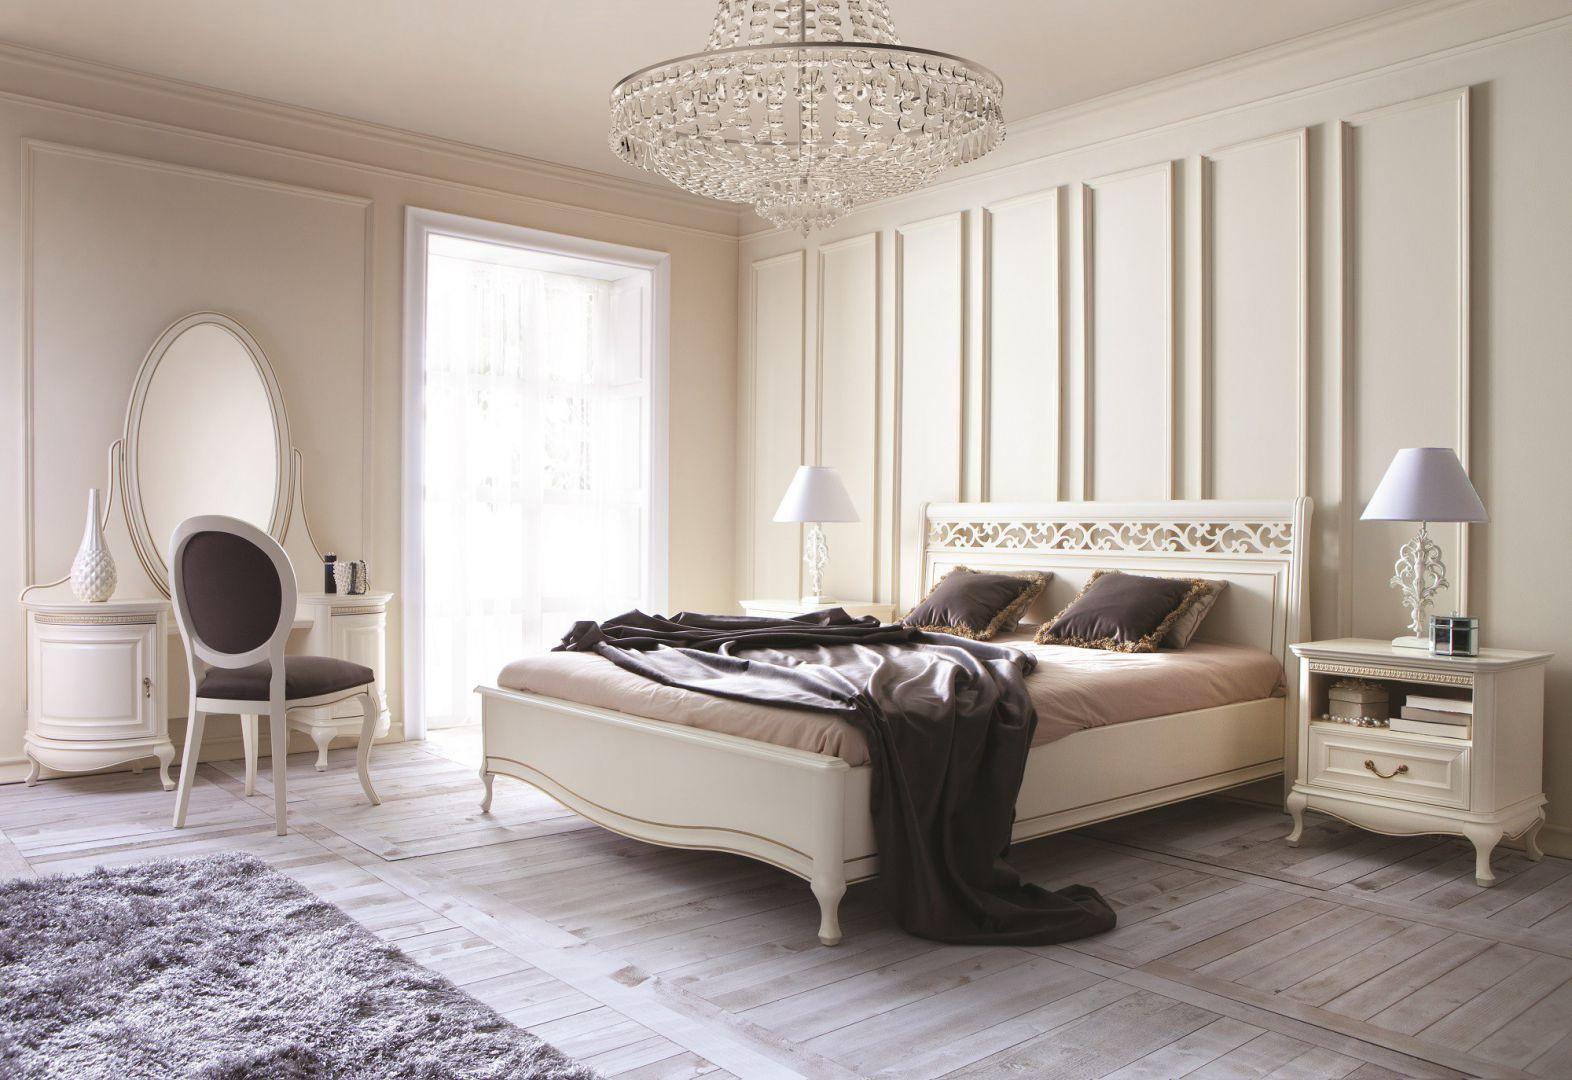 Klasyczne meble dodadzą romantycznej sypialni klasy i elegancji. Fot.Taranko.